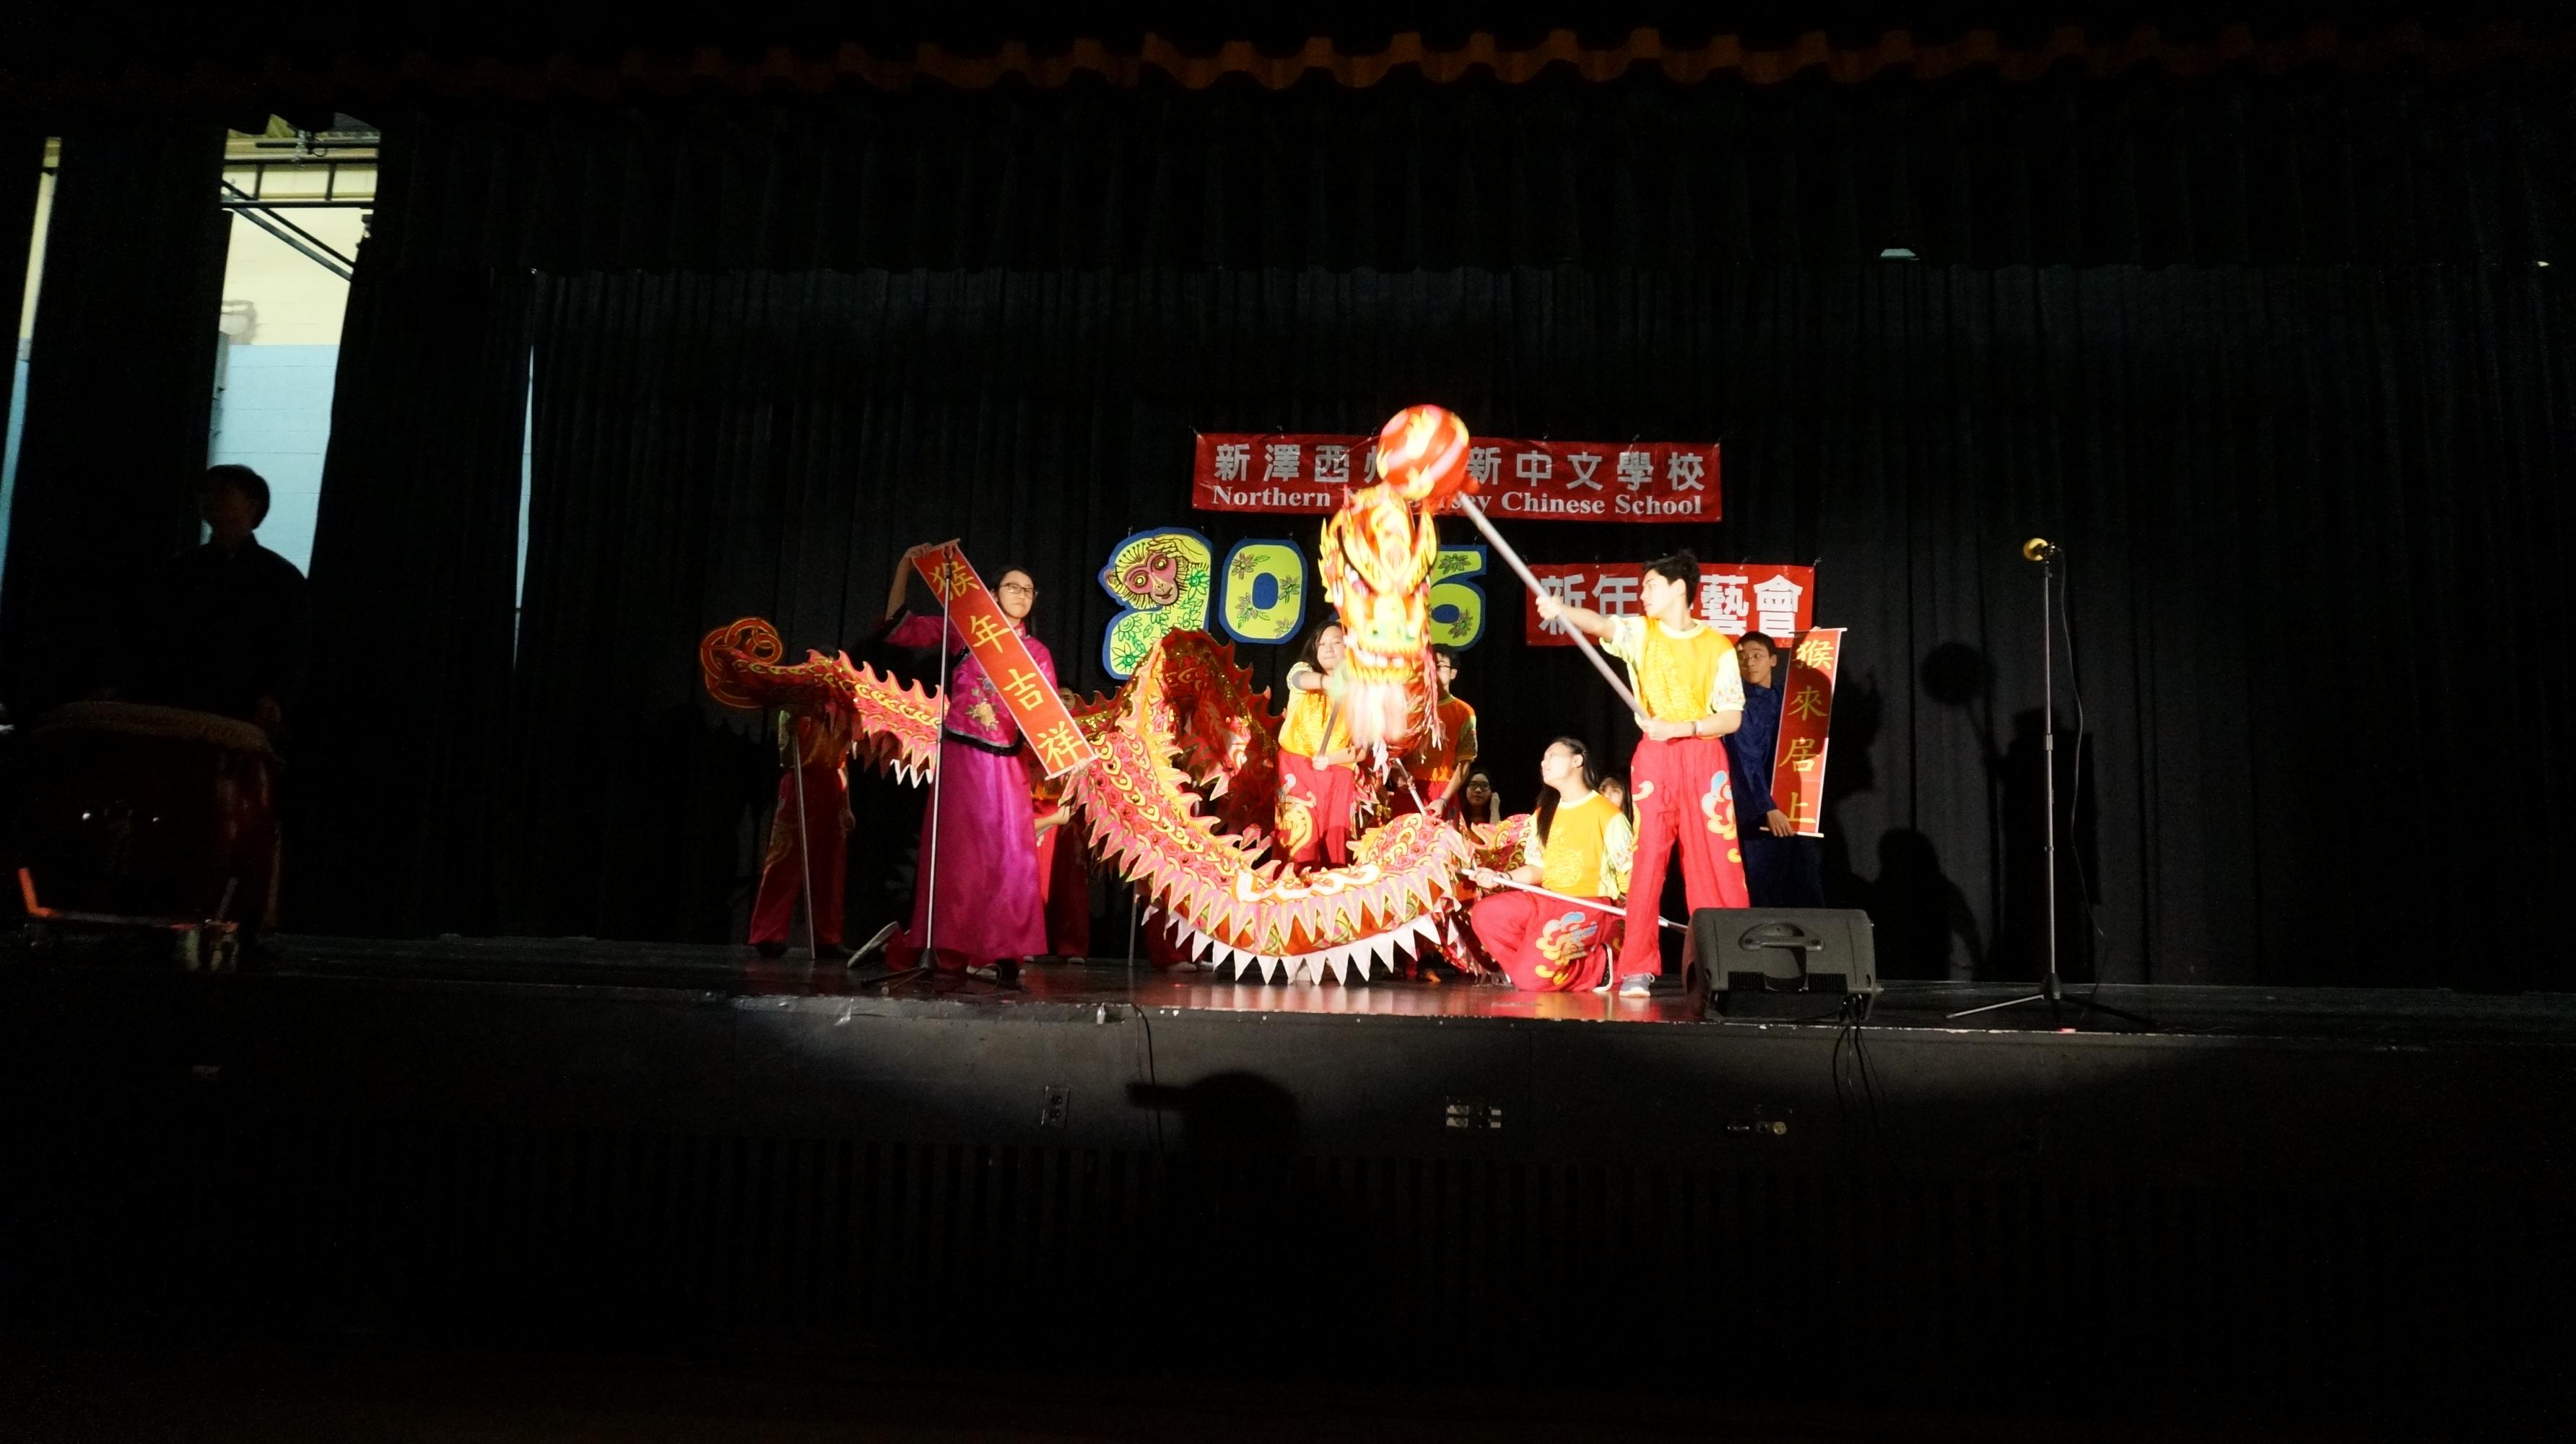 1acfc58a16b7c8dc8e79_aaa_Chinese_New_Year_pix_038.JPG